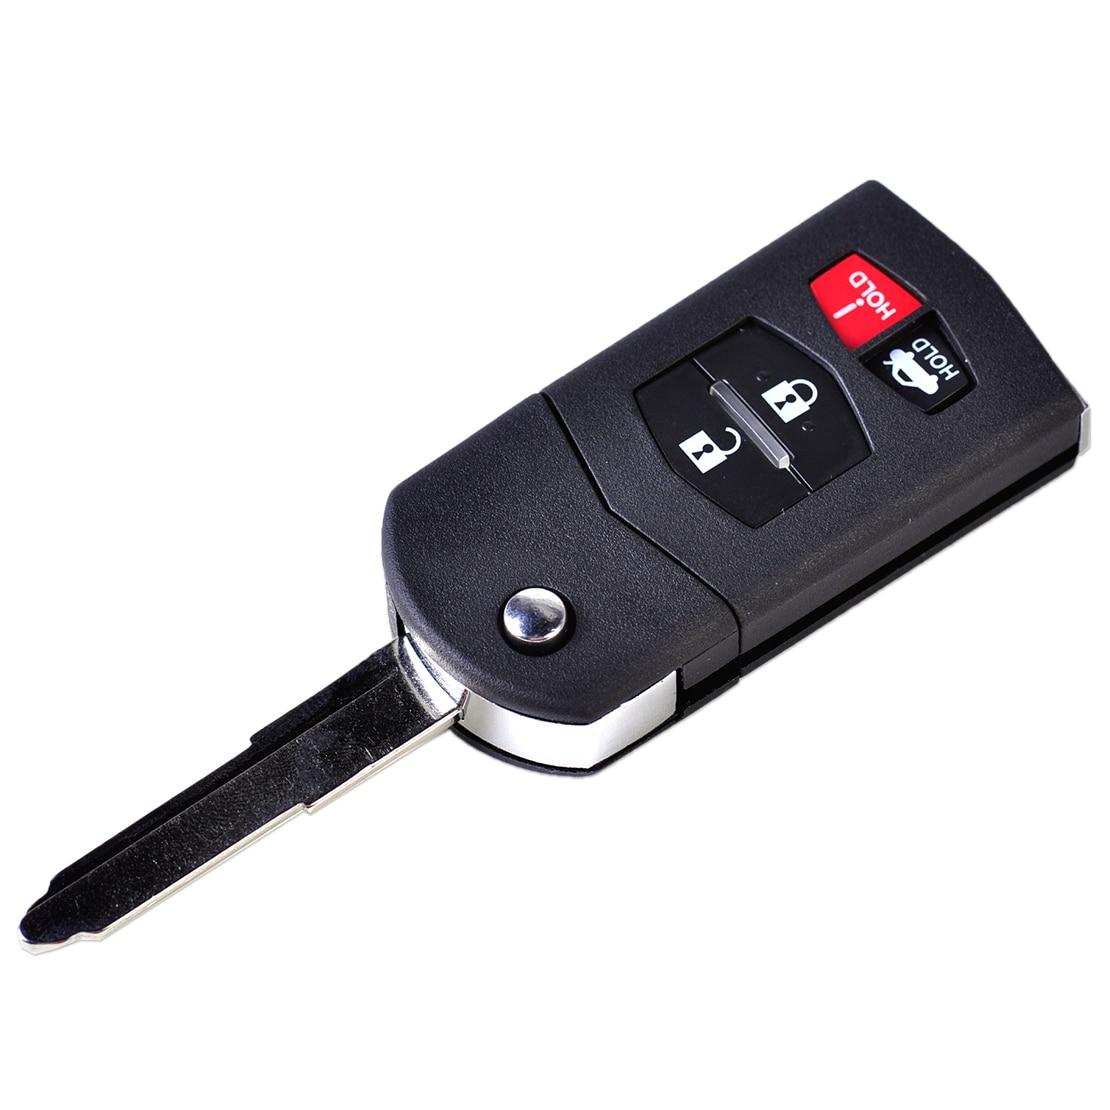 DWCX 4 Taste Klapp Fernbedienung Keyless Key Fob Shell Fall Gehäuse für Mazda 3 6 2010-2012 Für MX-5 Miata 2006 2007-2012